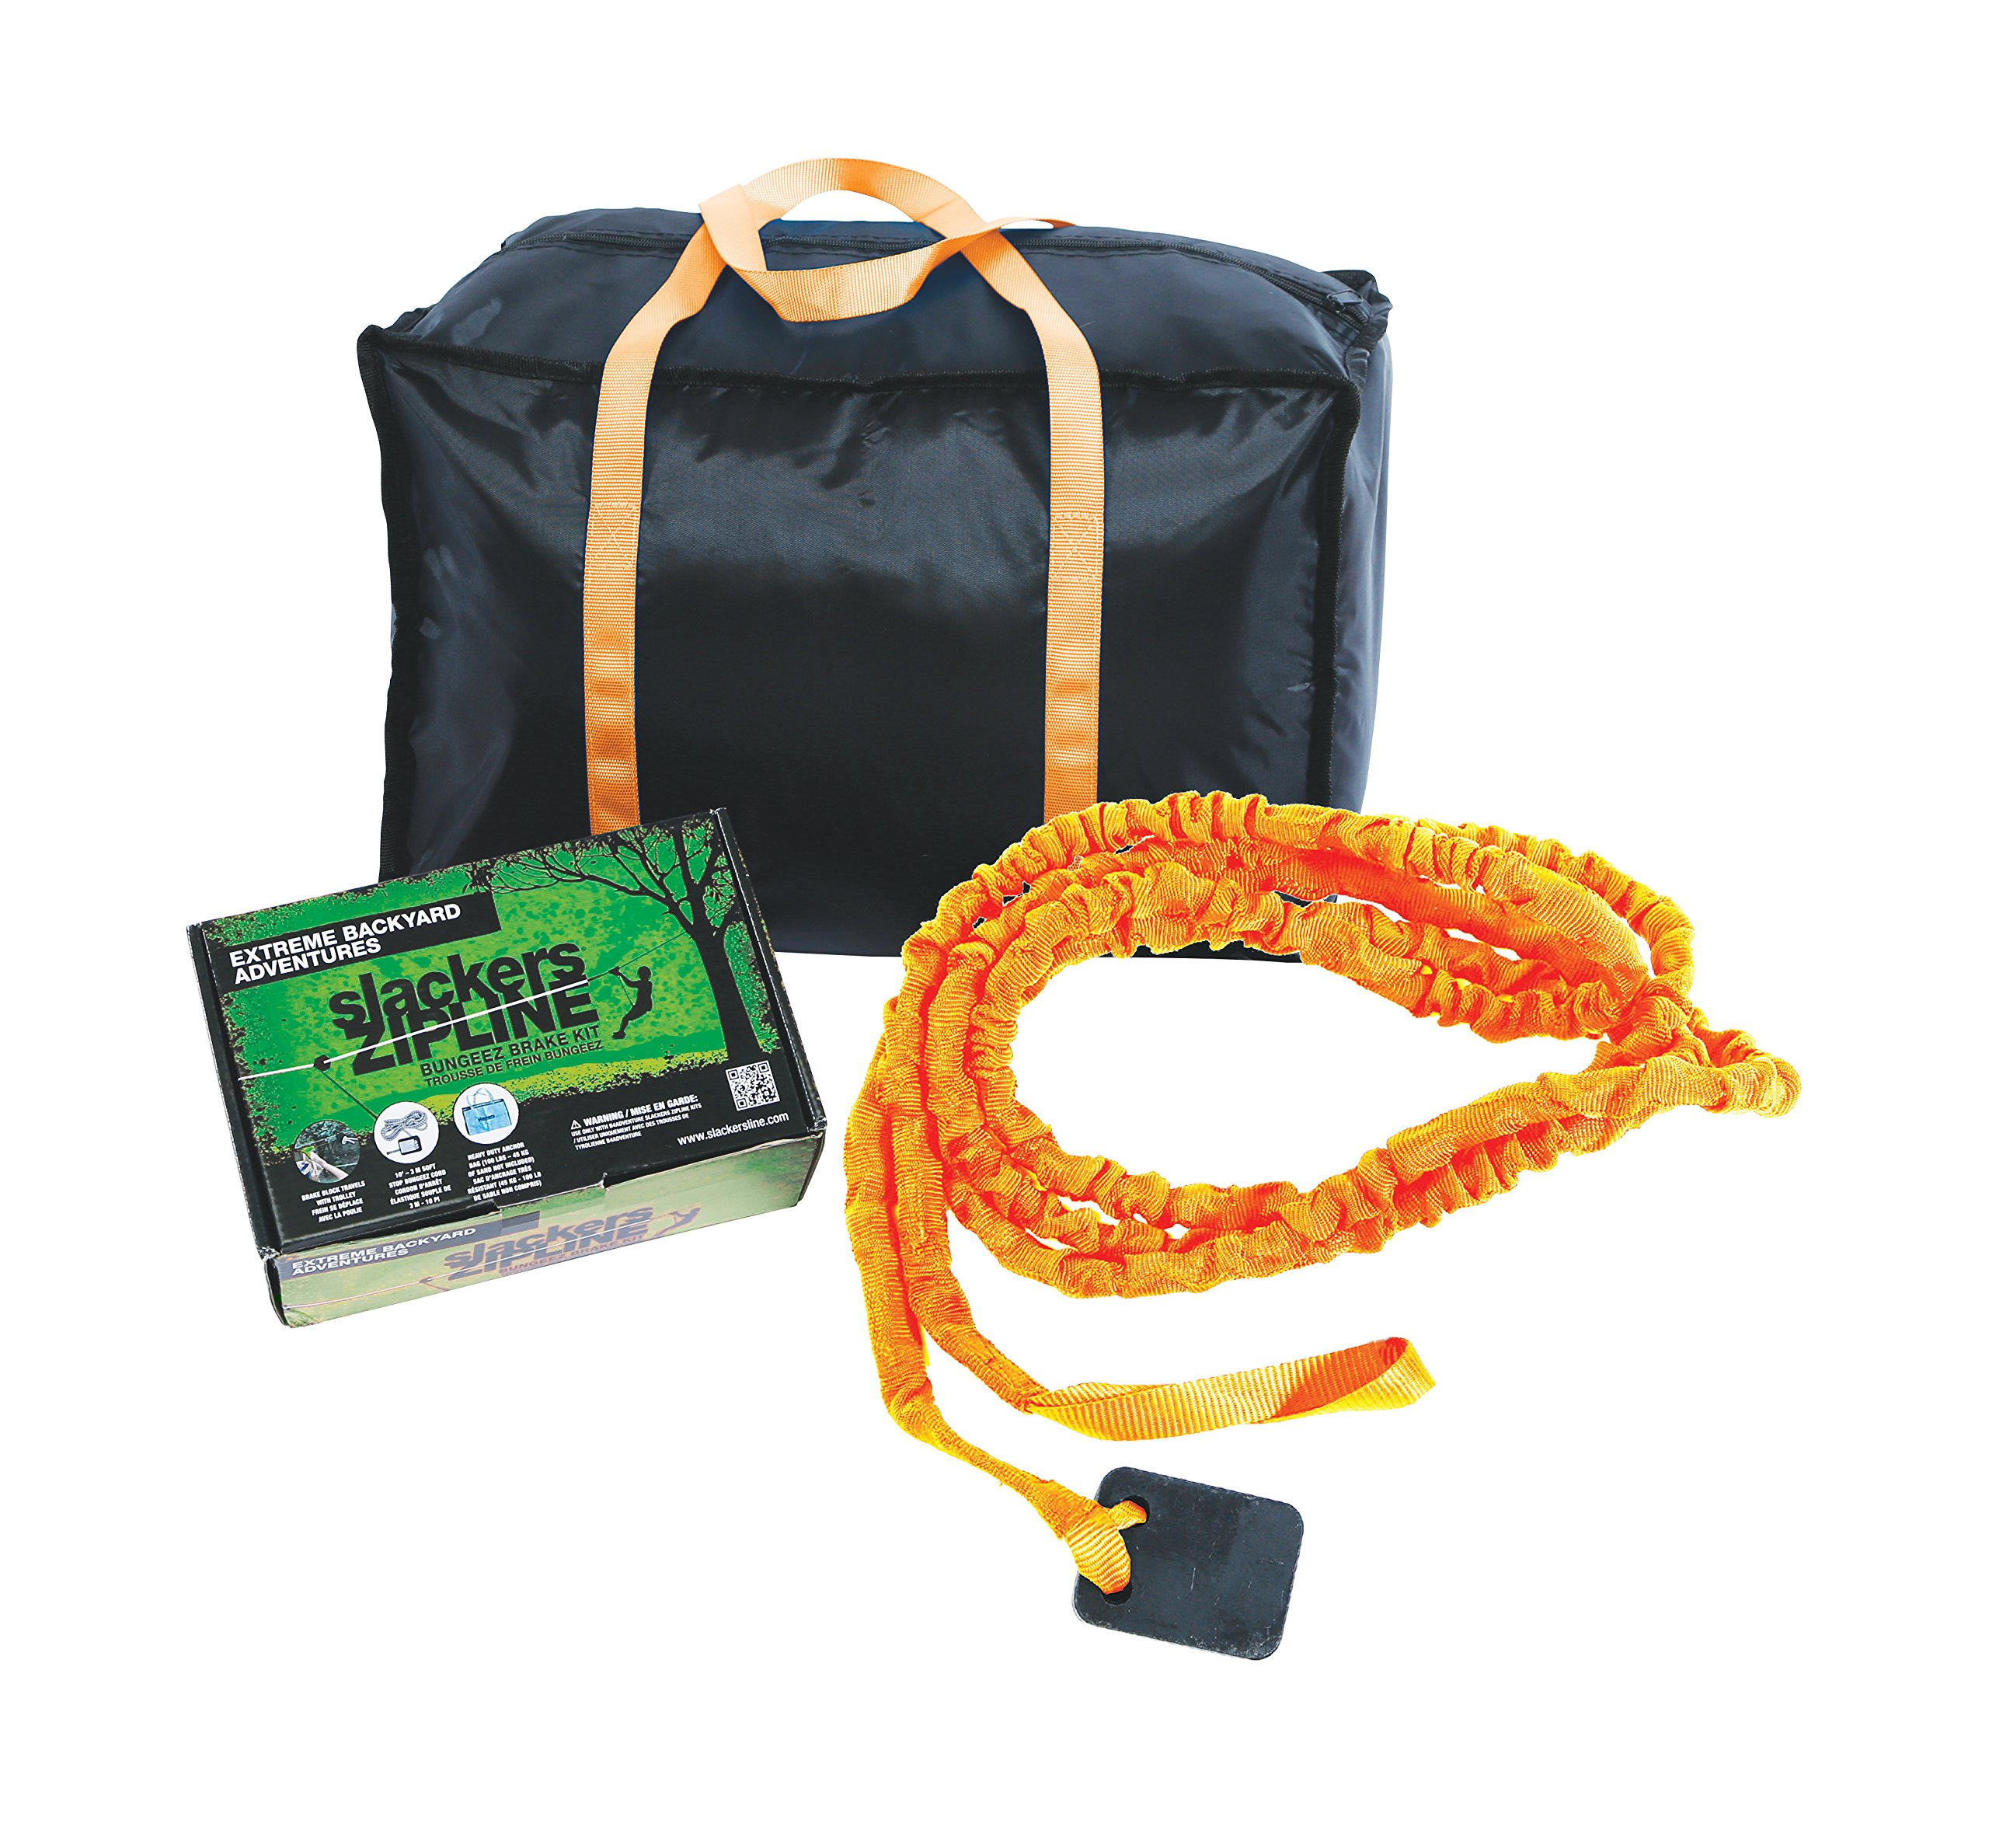 slackers Zipline Deluxe Bungeez Brake Kit, One Size, Orange/Black